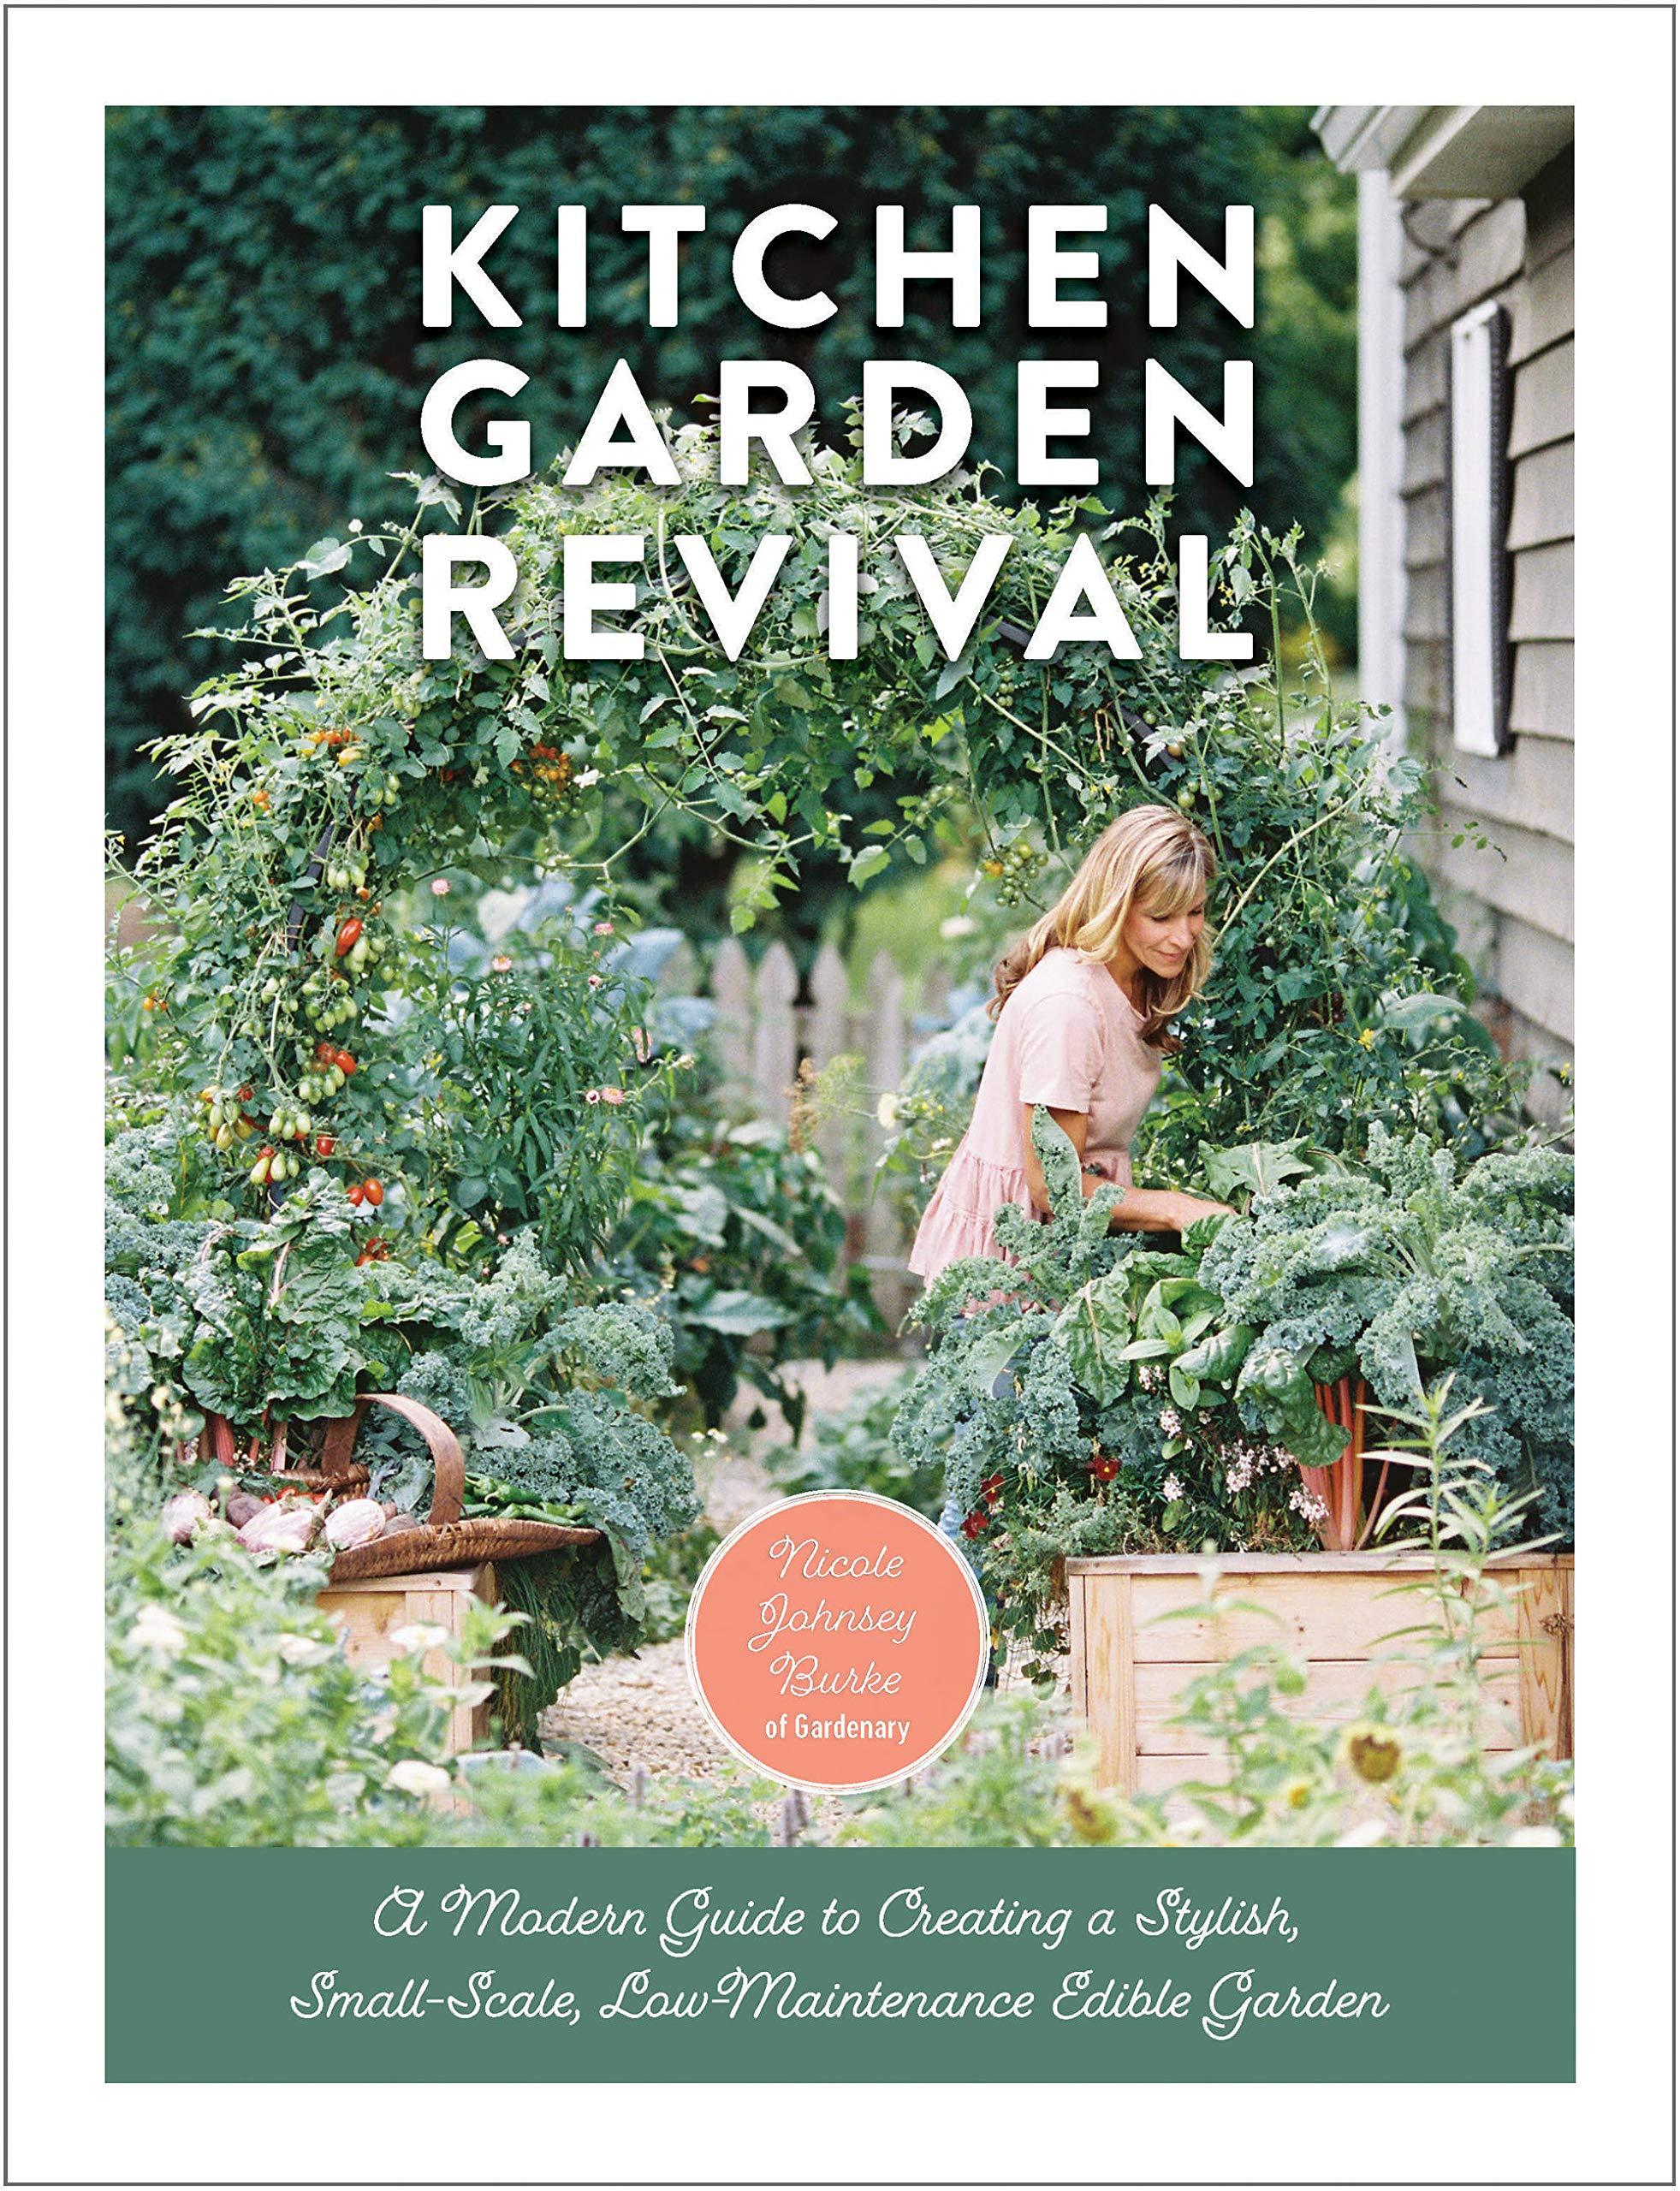 Kitchen Garden Revival by Nicole Johnsey Burke